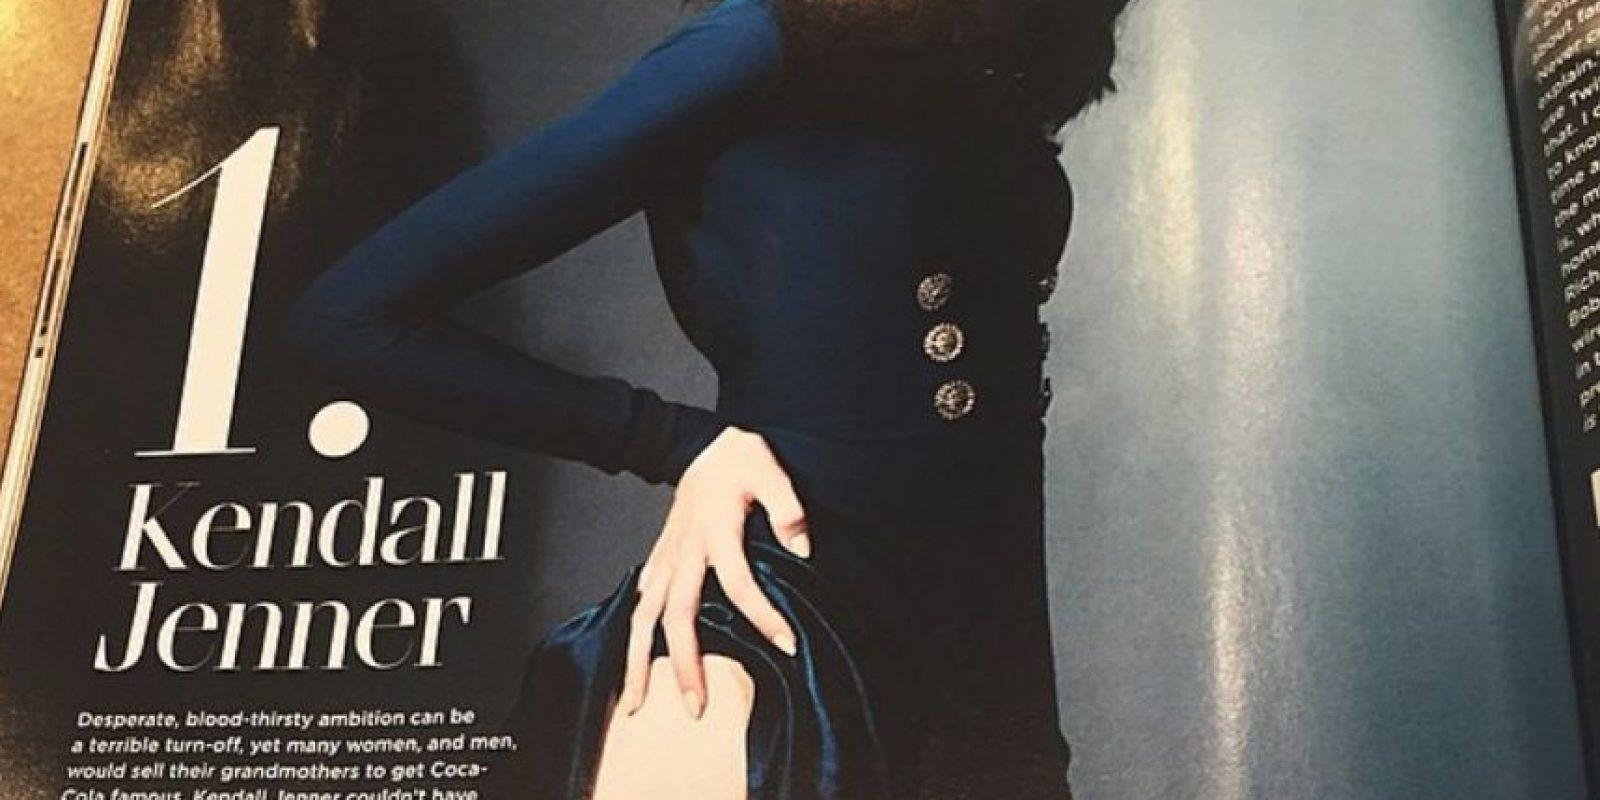 Sigue luchando por su carrera Foto:Instagram/Kendall Jenner